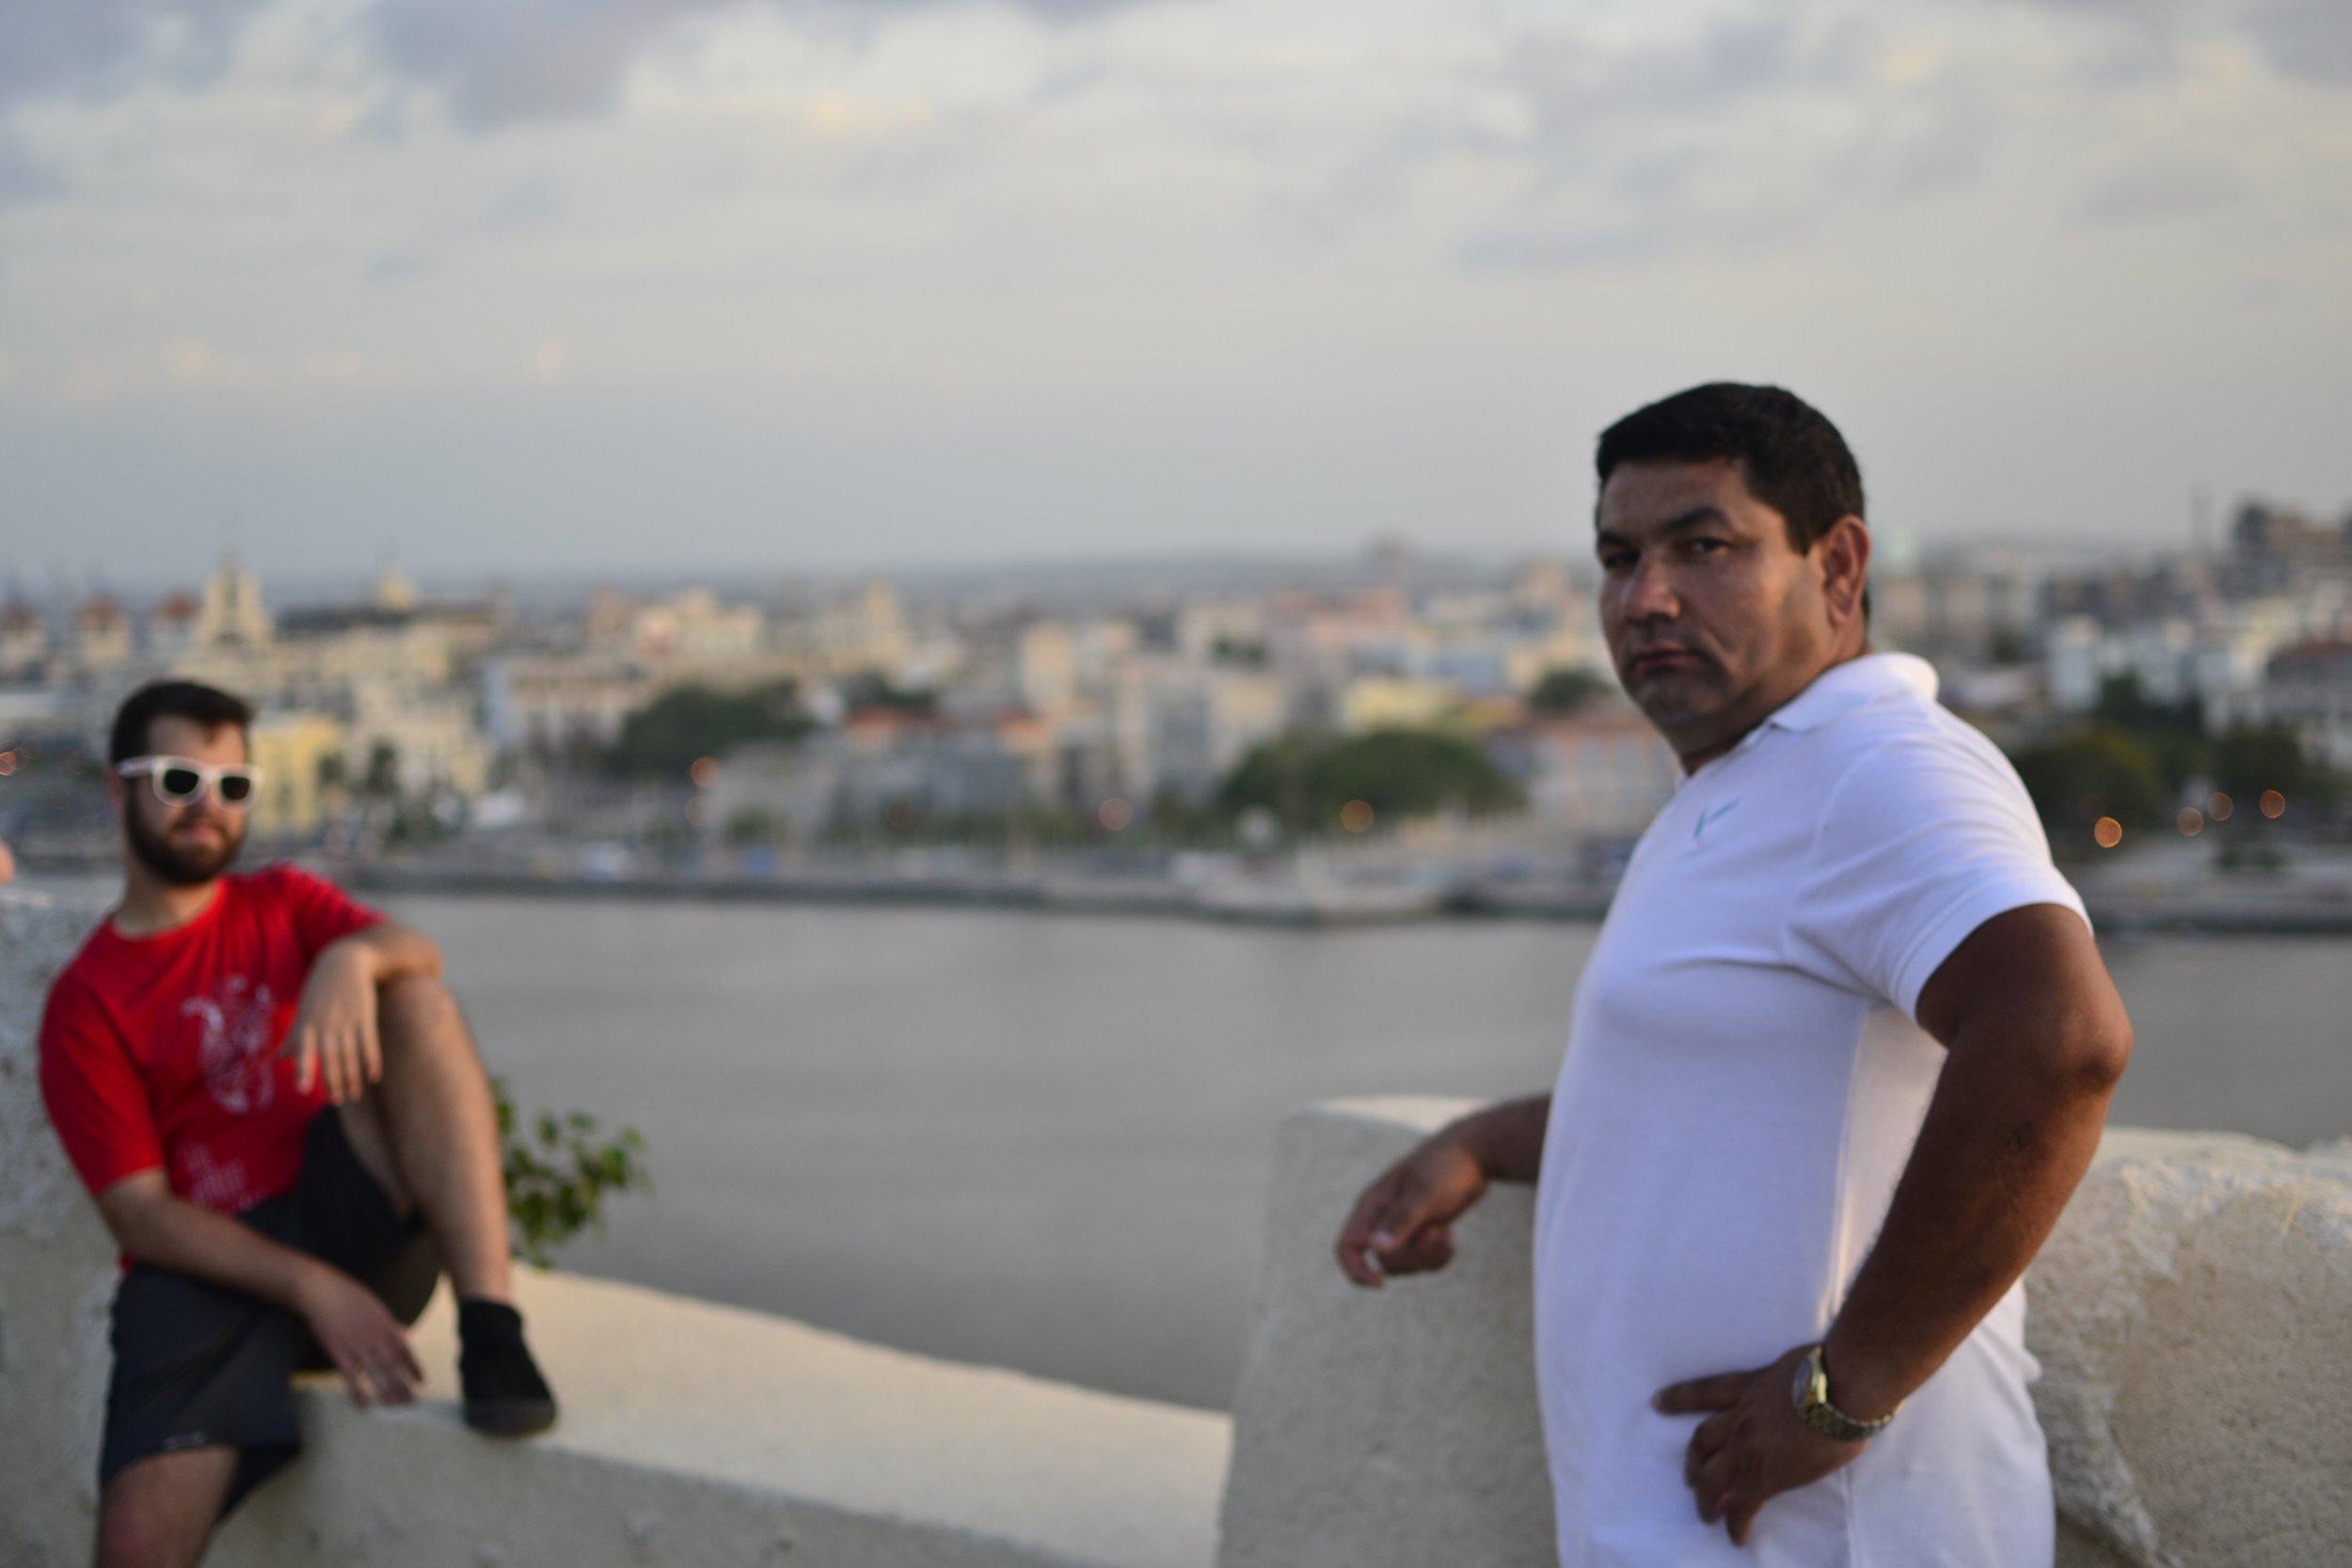 Jeremy and Santiago in Havana, Cuba